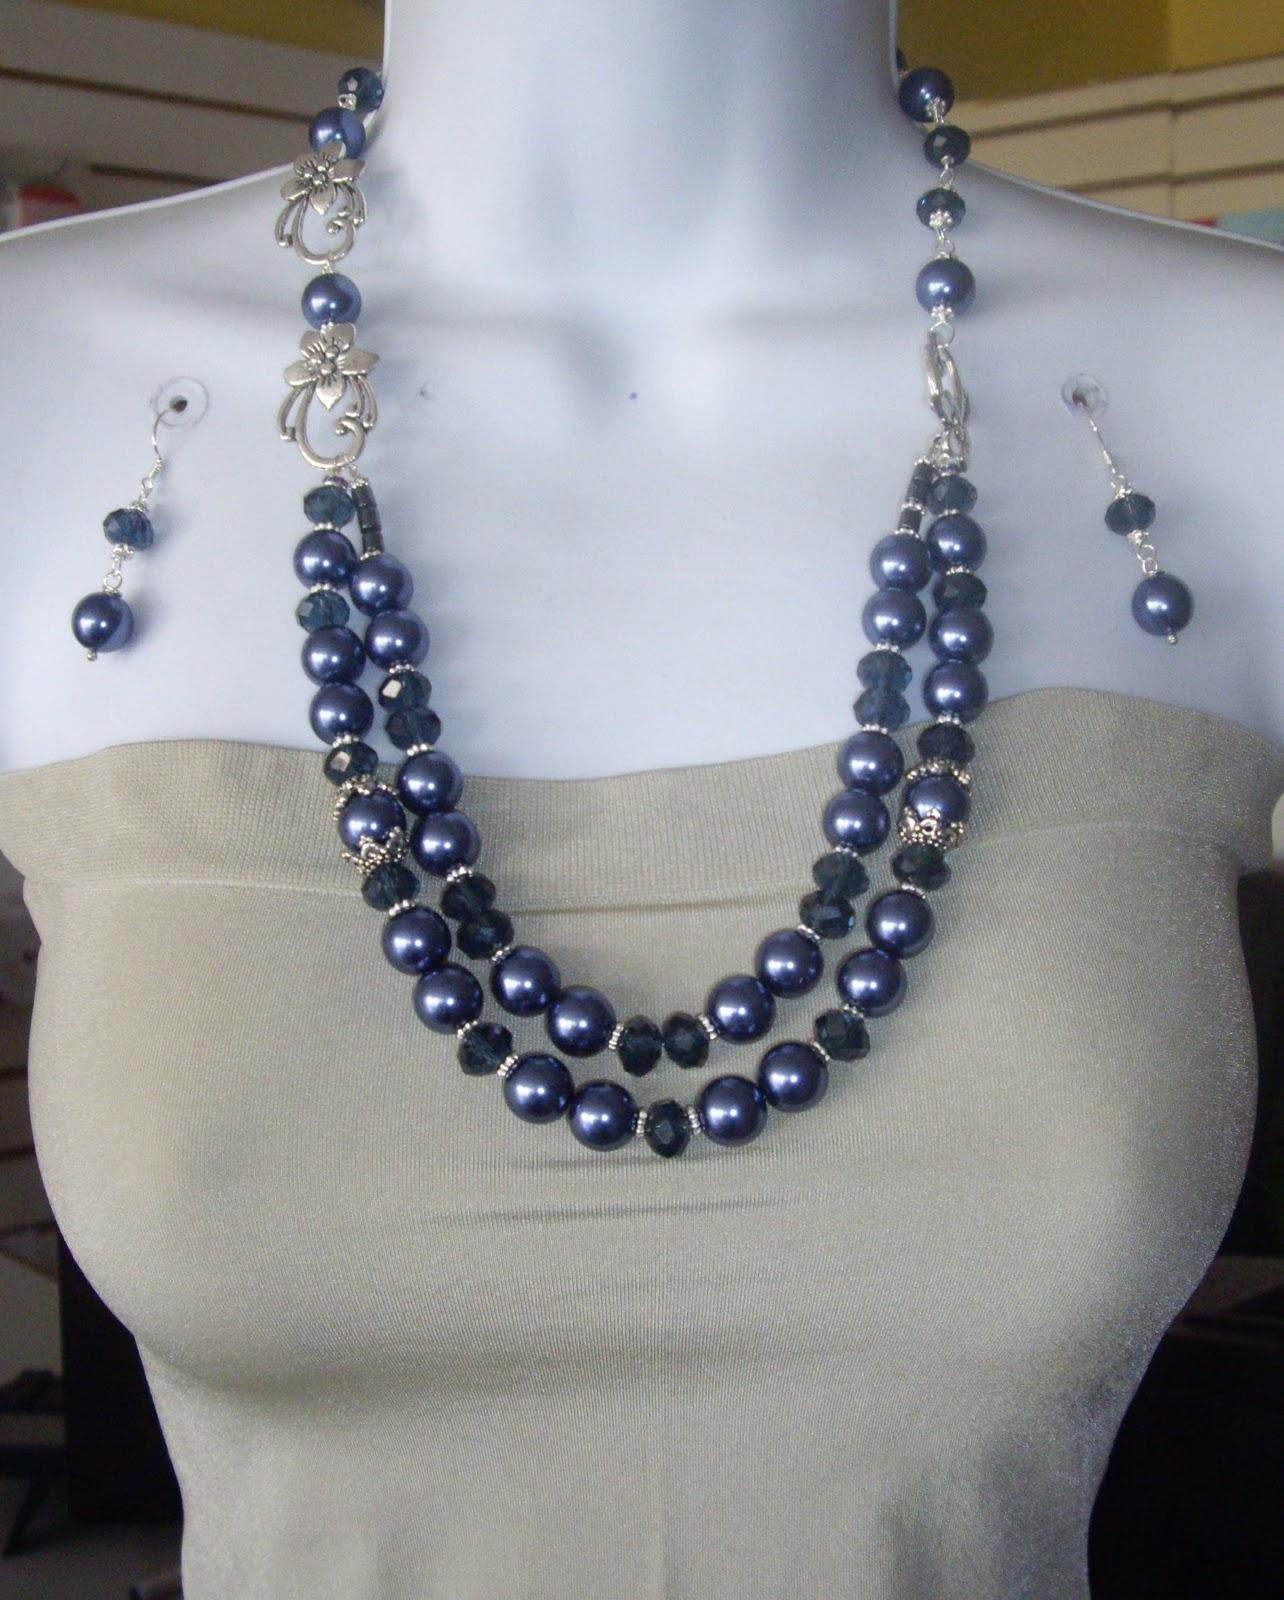 f34a3a11820a IDEA Collar de perlas Collares Pearls Jewelry y Beads t